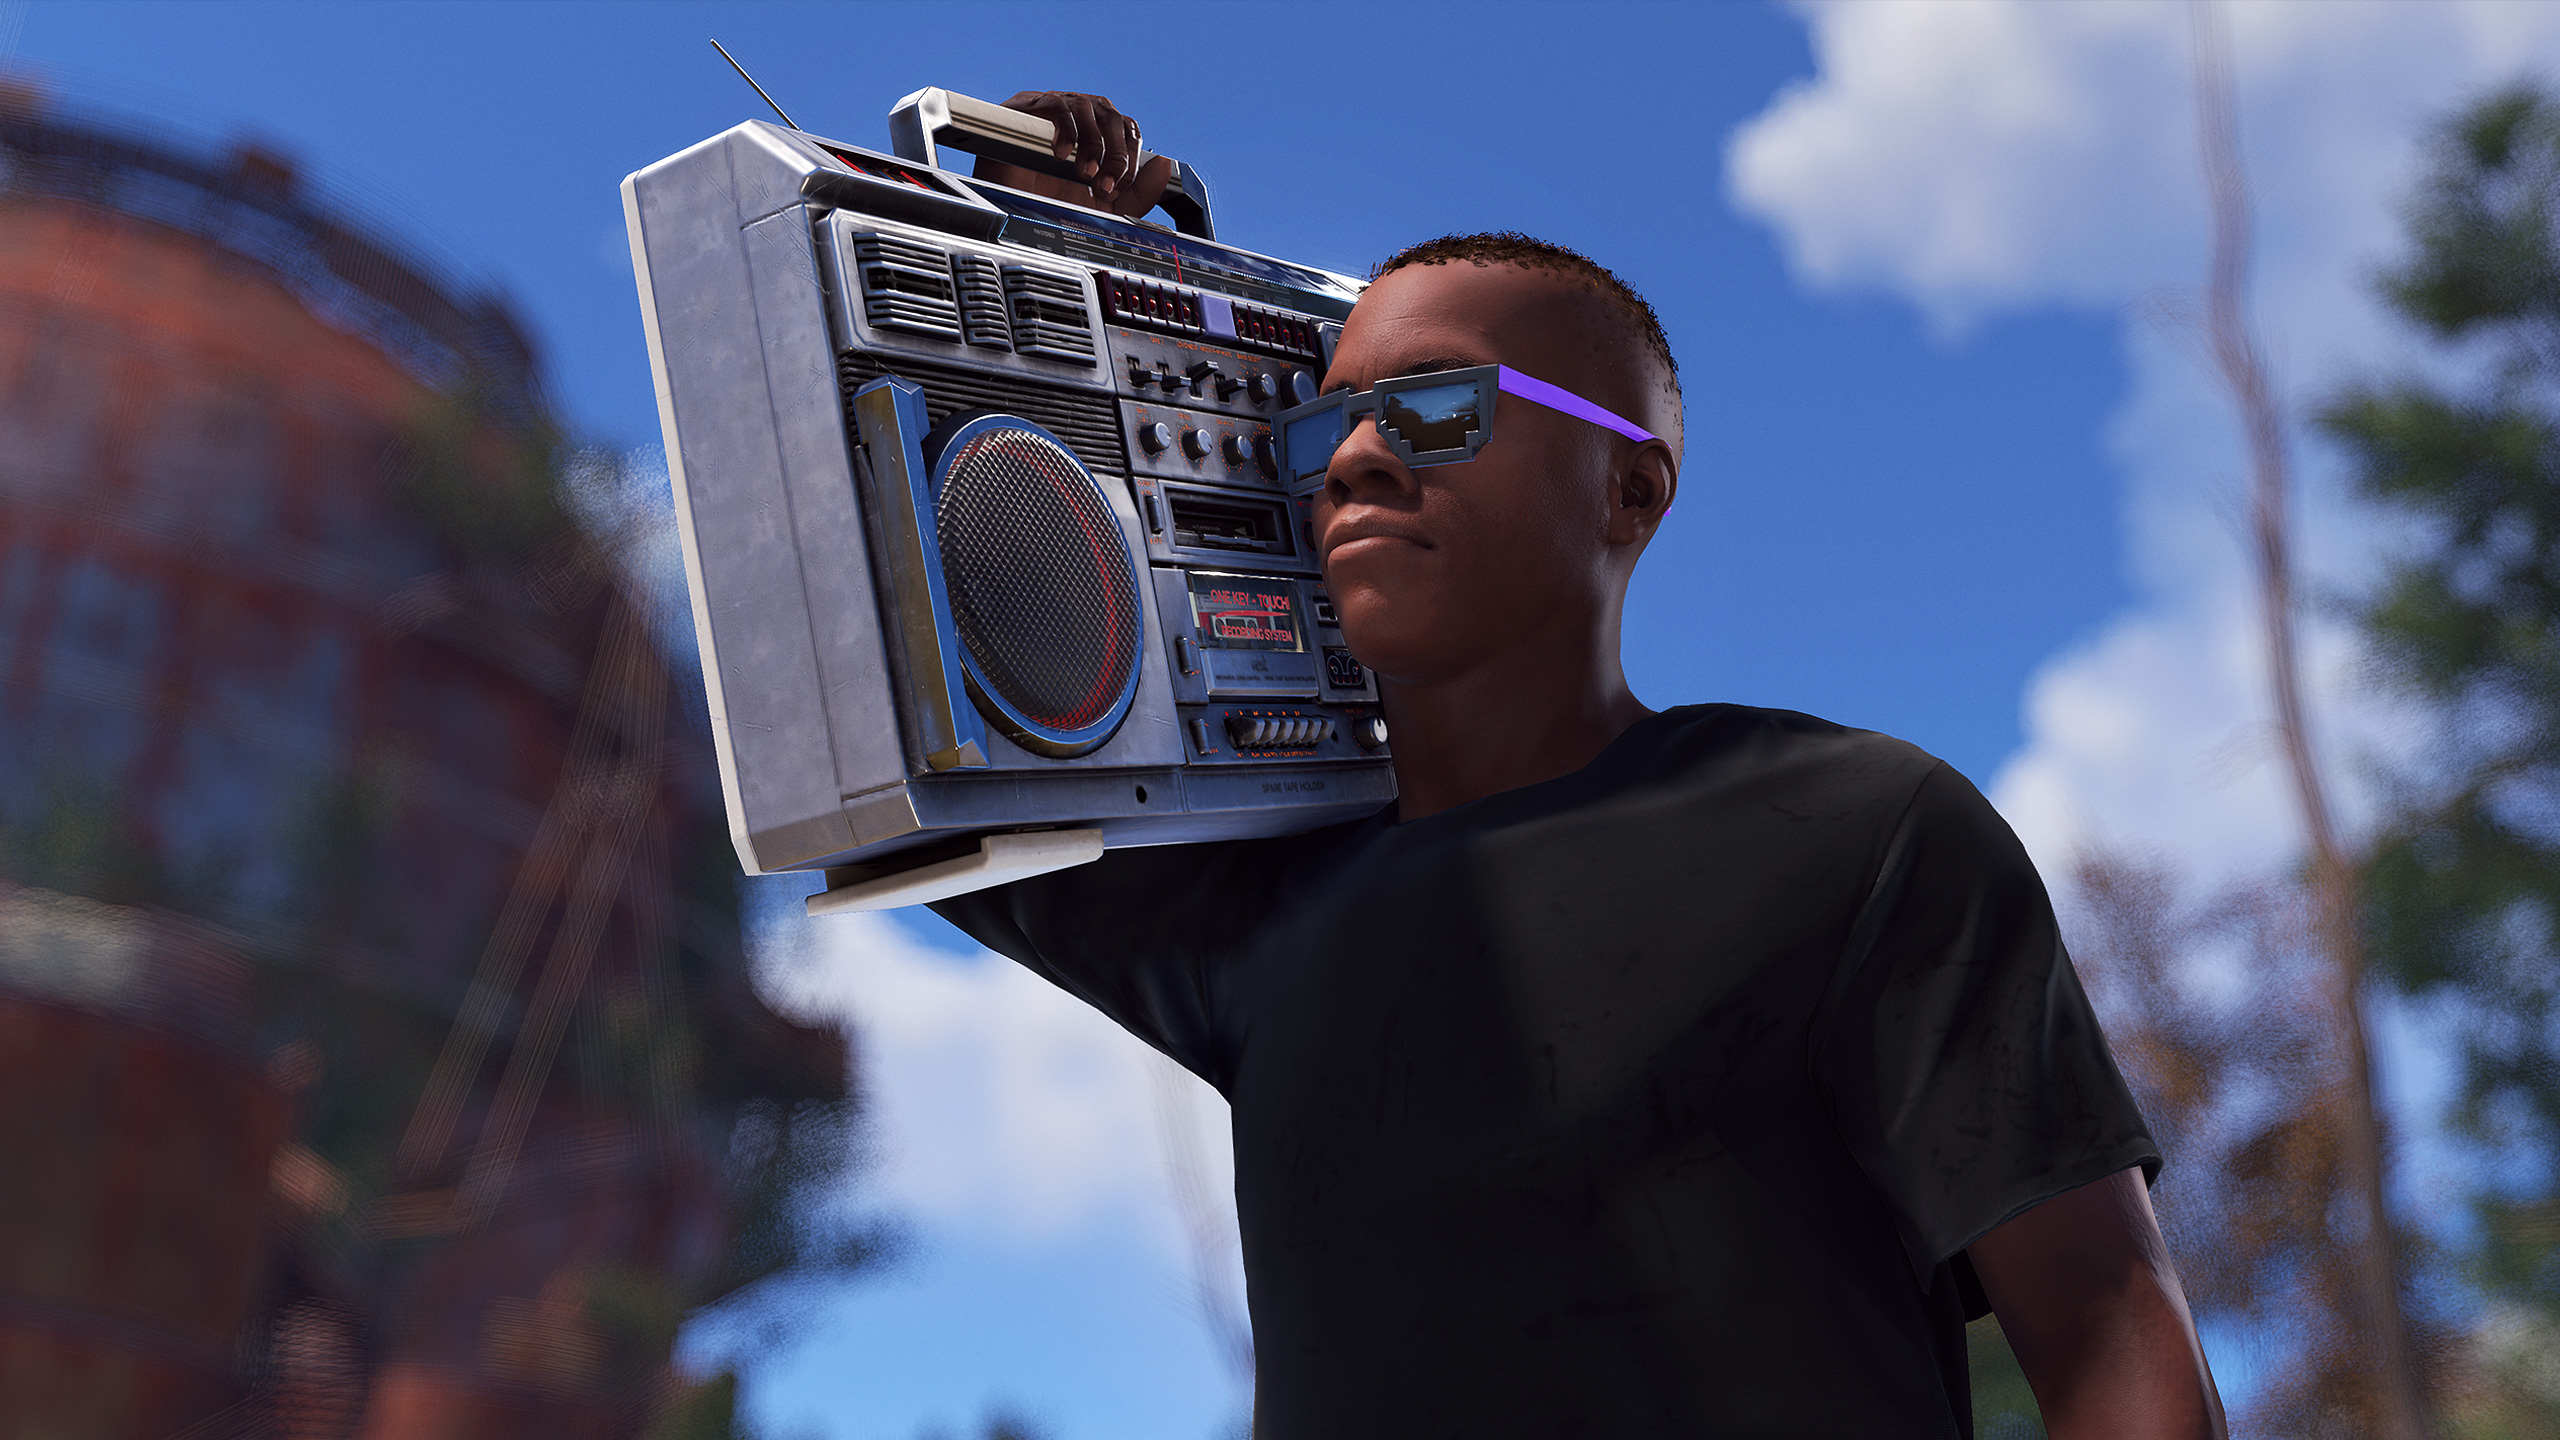 boombox1.jpg